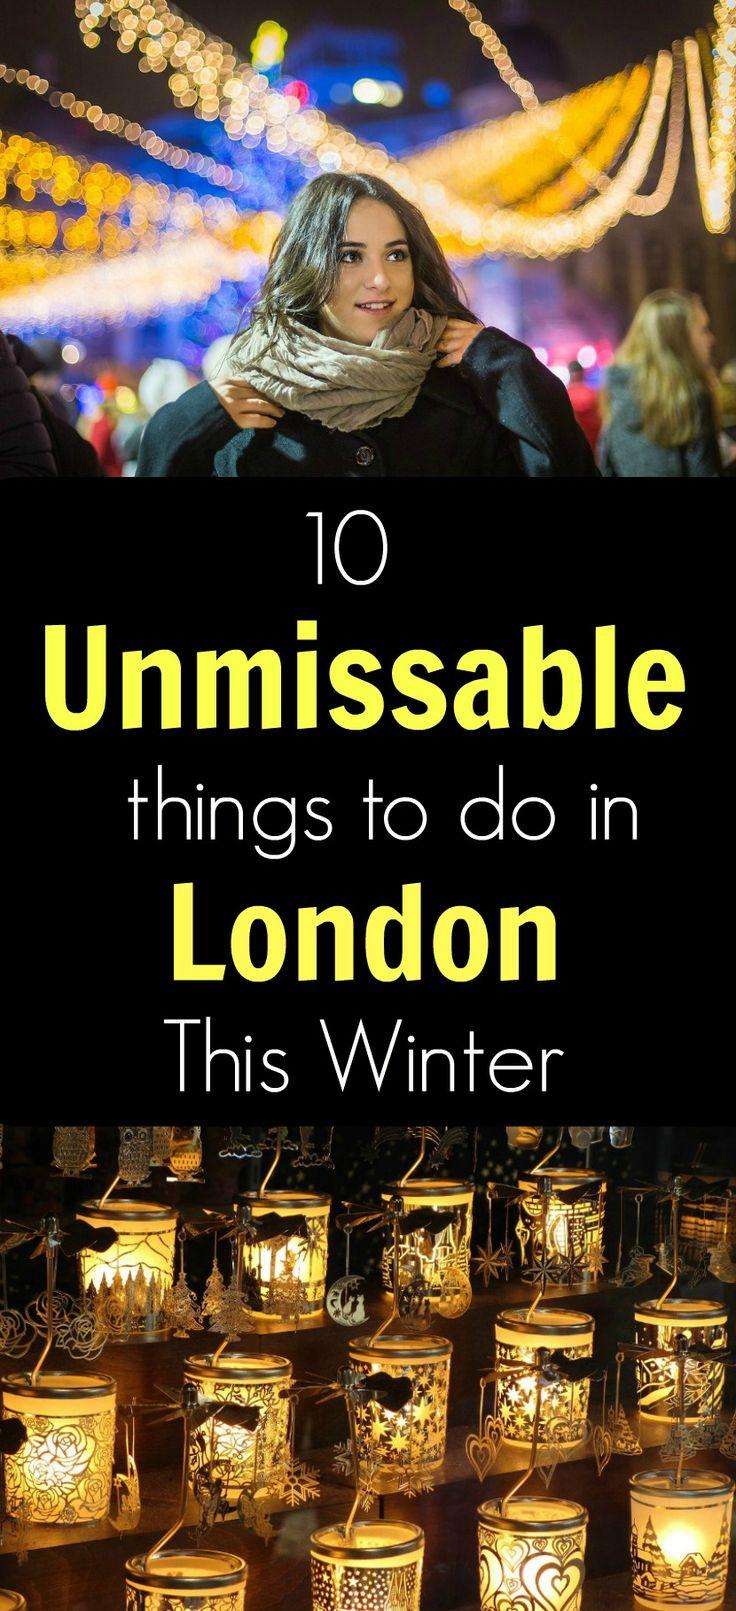 winter-london-2016 #RePin by AT Social Media Marketing - Pinterest Marketing Specialists ATSocialMedia.co.uk